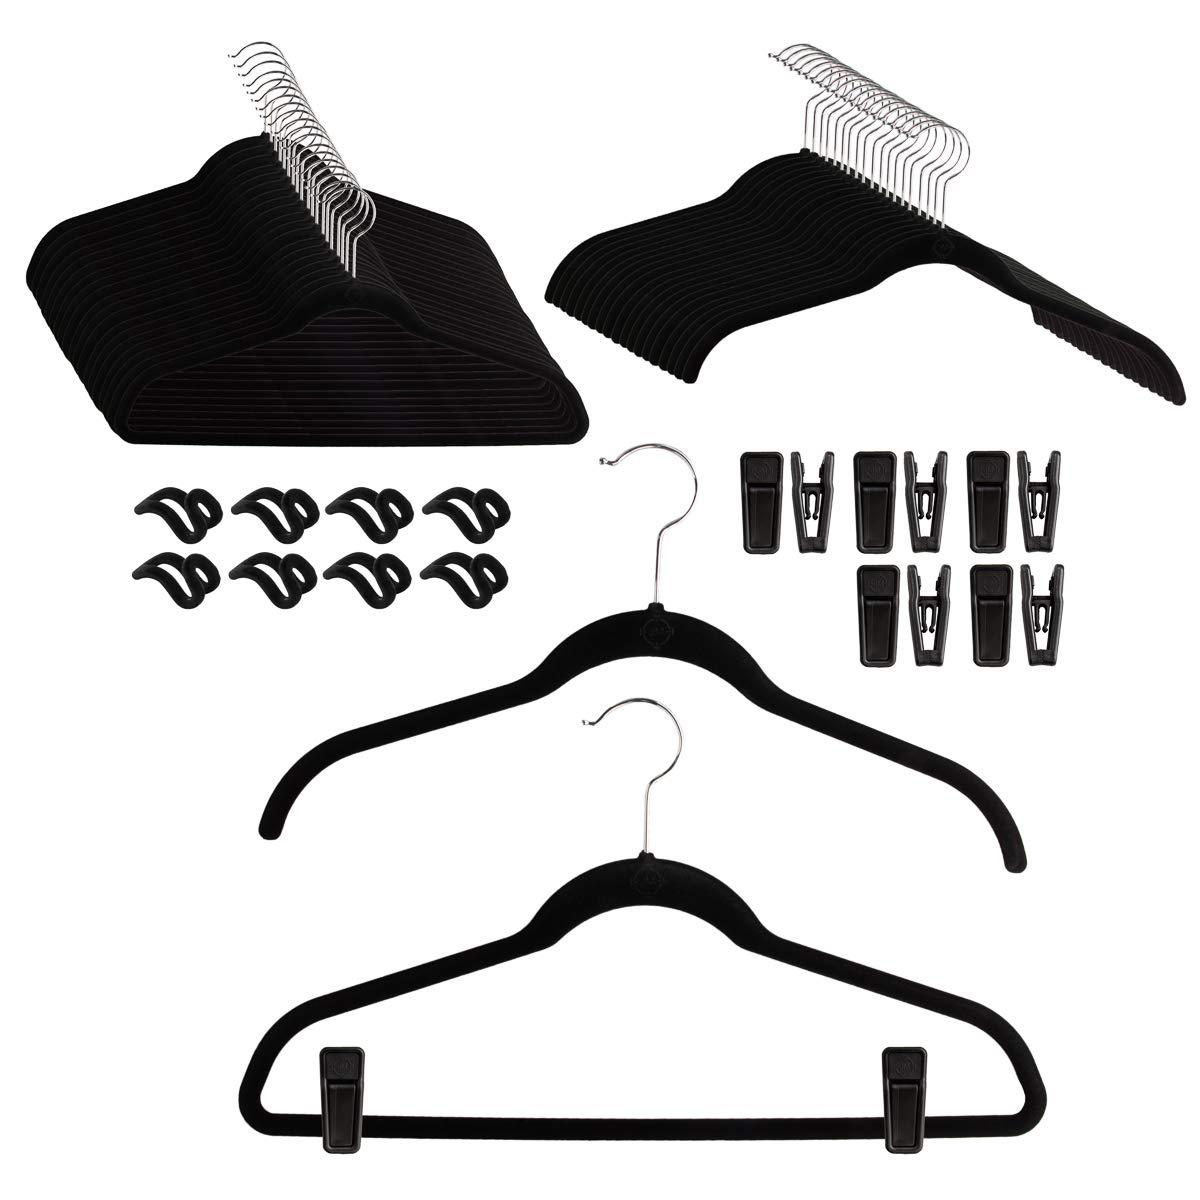 Joy Mangano (68 Piece Set Huggable Clothing Hangers Non Slip Velvet Hangers with Finger Clips Space Saving Clothes Hanger with Bar